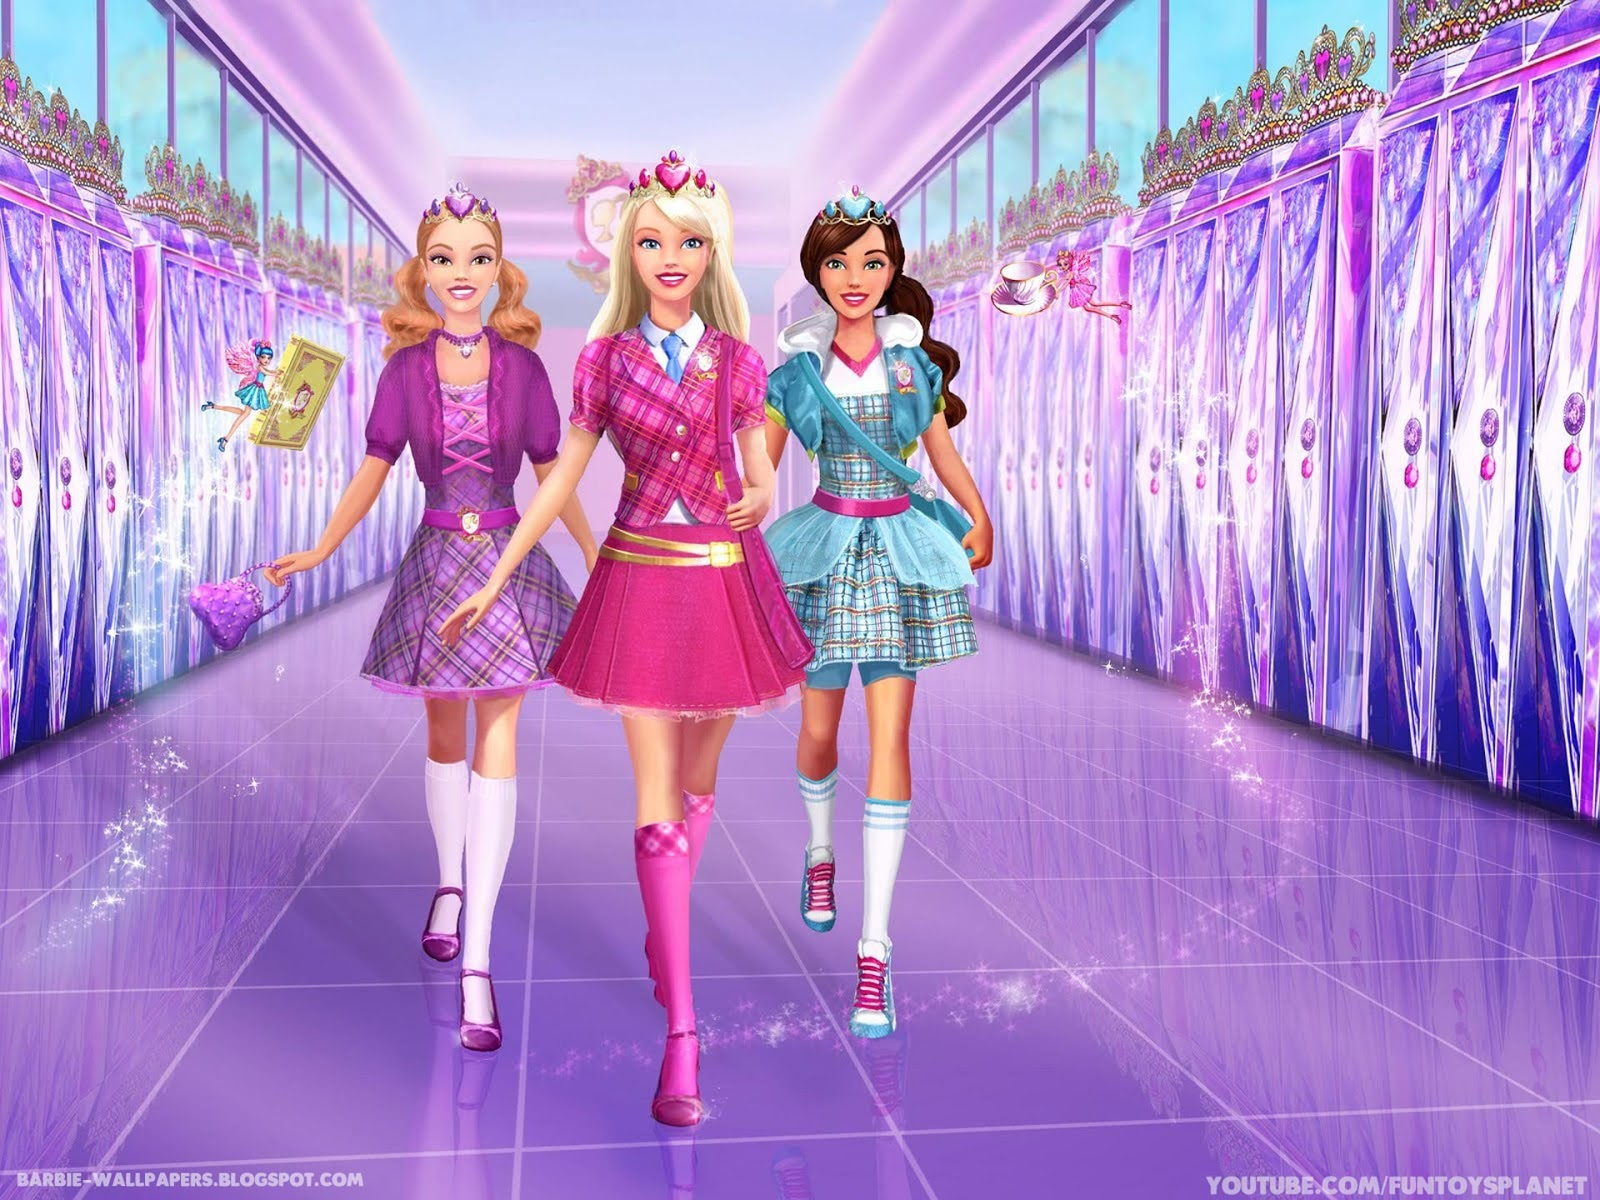 barbie, barbie picture, barbie pictures, barbie wallpaper, barbie wallpapers free, new barbie, new barbie wallpapers, barbie wallpapers, barbie wallpaper hd ...